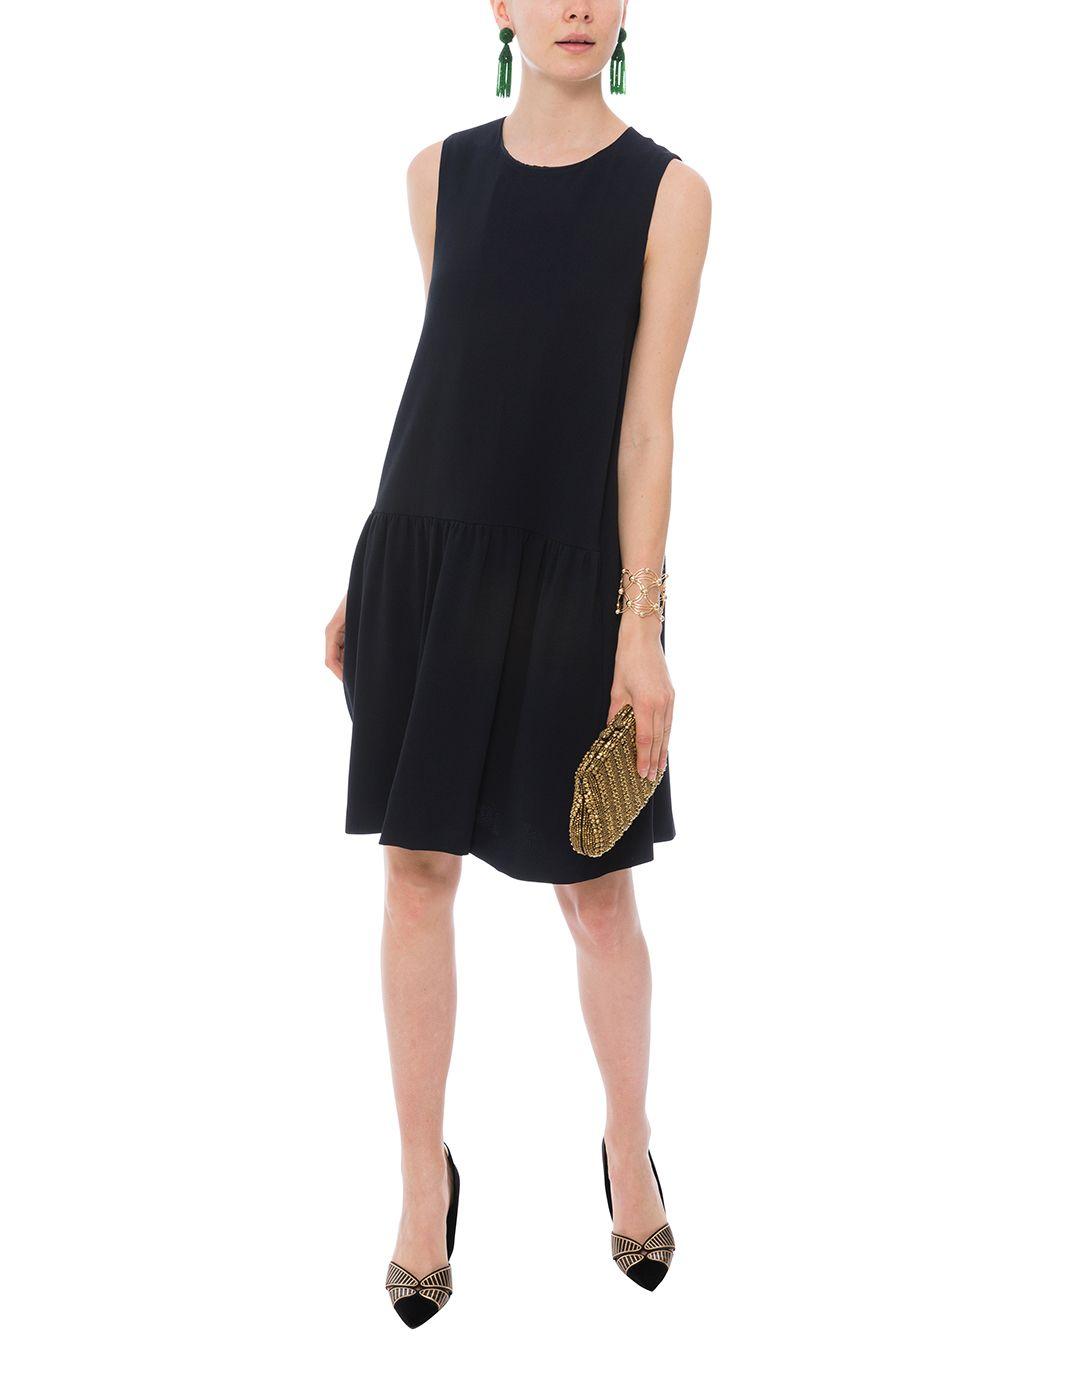 Penny Midnight Blue Gathered Hem Dress S Maxmara Halsbrook Hem Dress Clothes Little Black Dress [ 1380 x 1086 Pixel ]